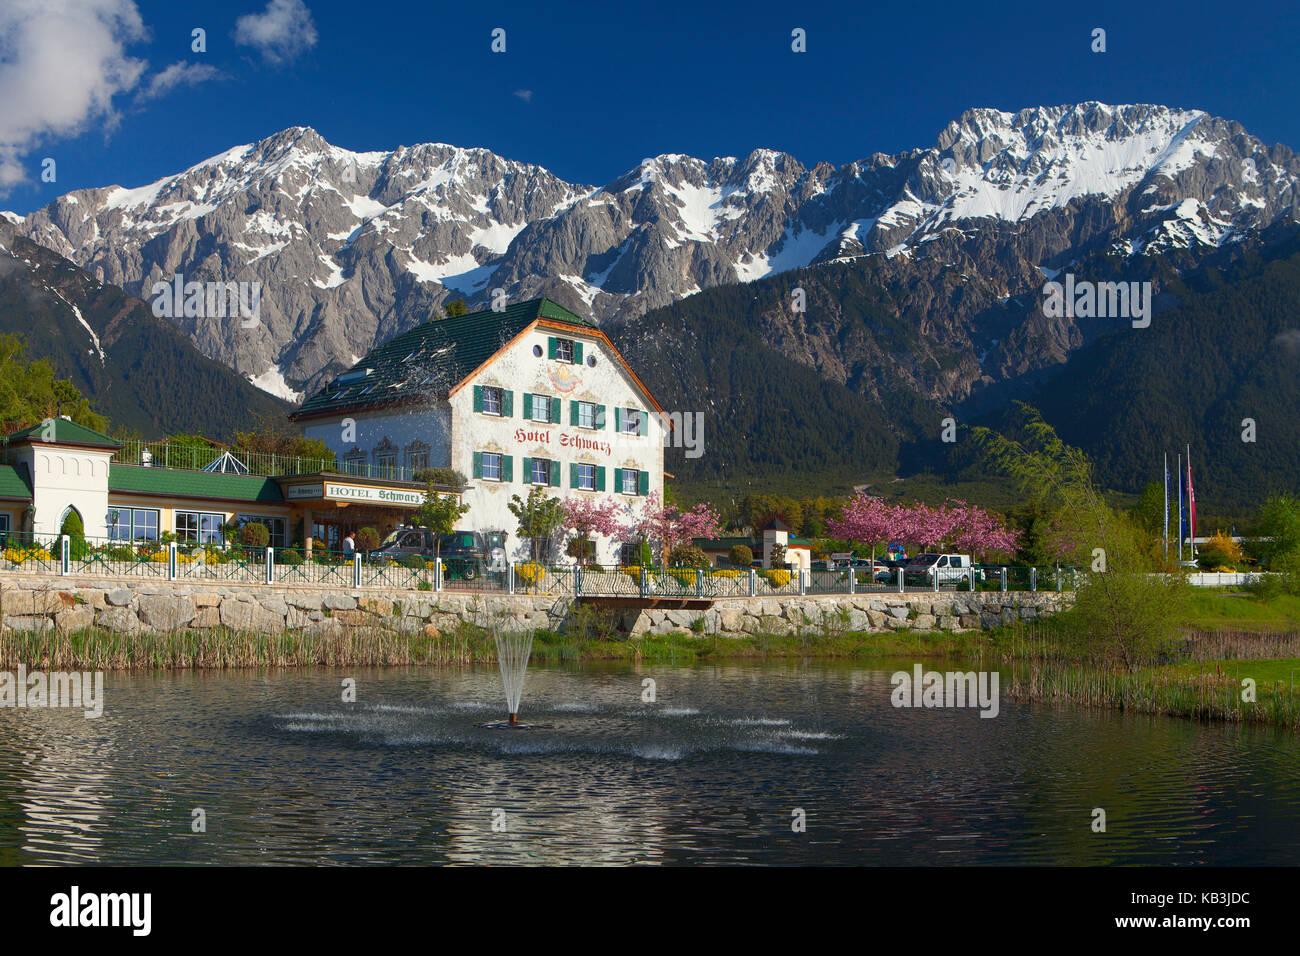 Hotel Schwarz in Mieming, Tyrol, - Stock Image